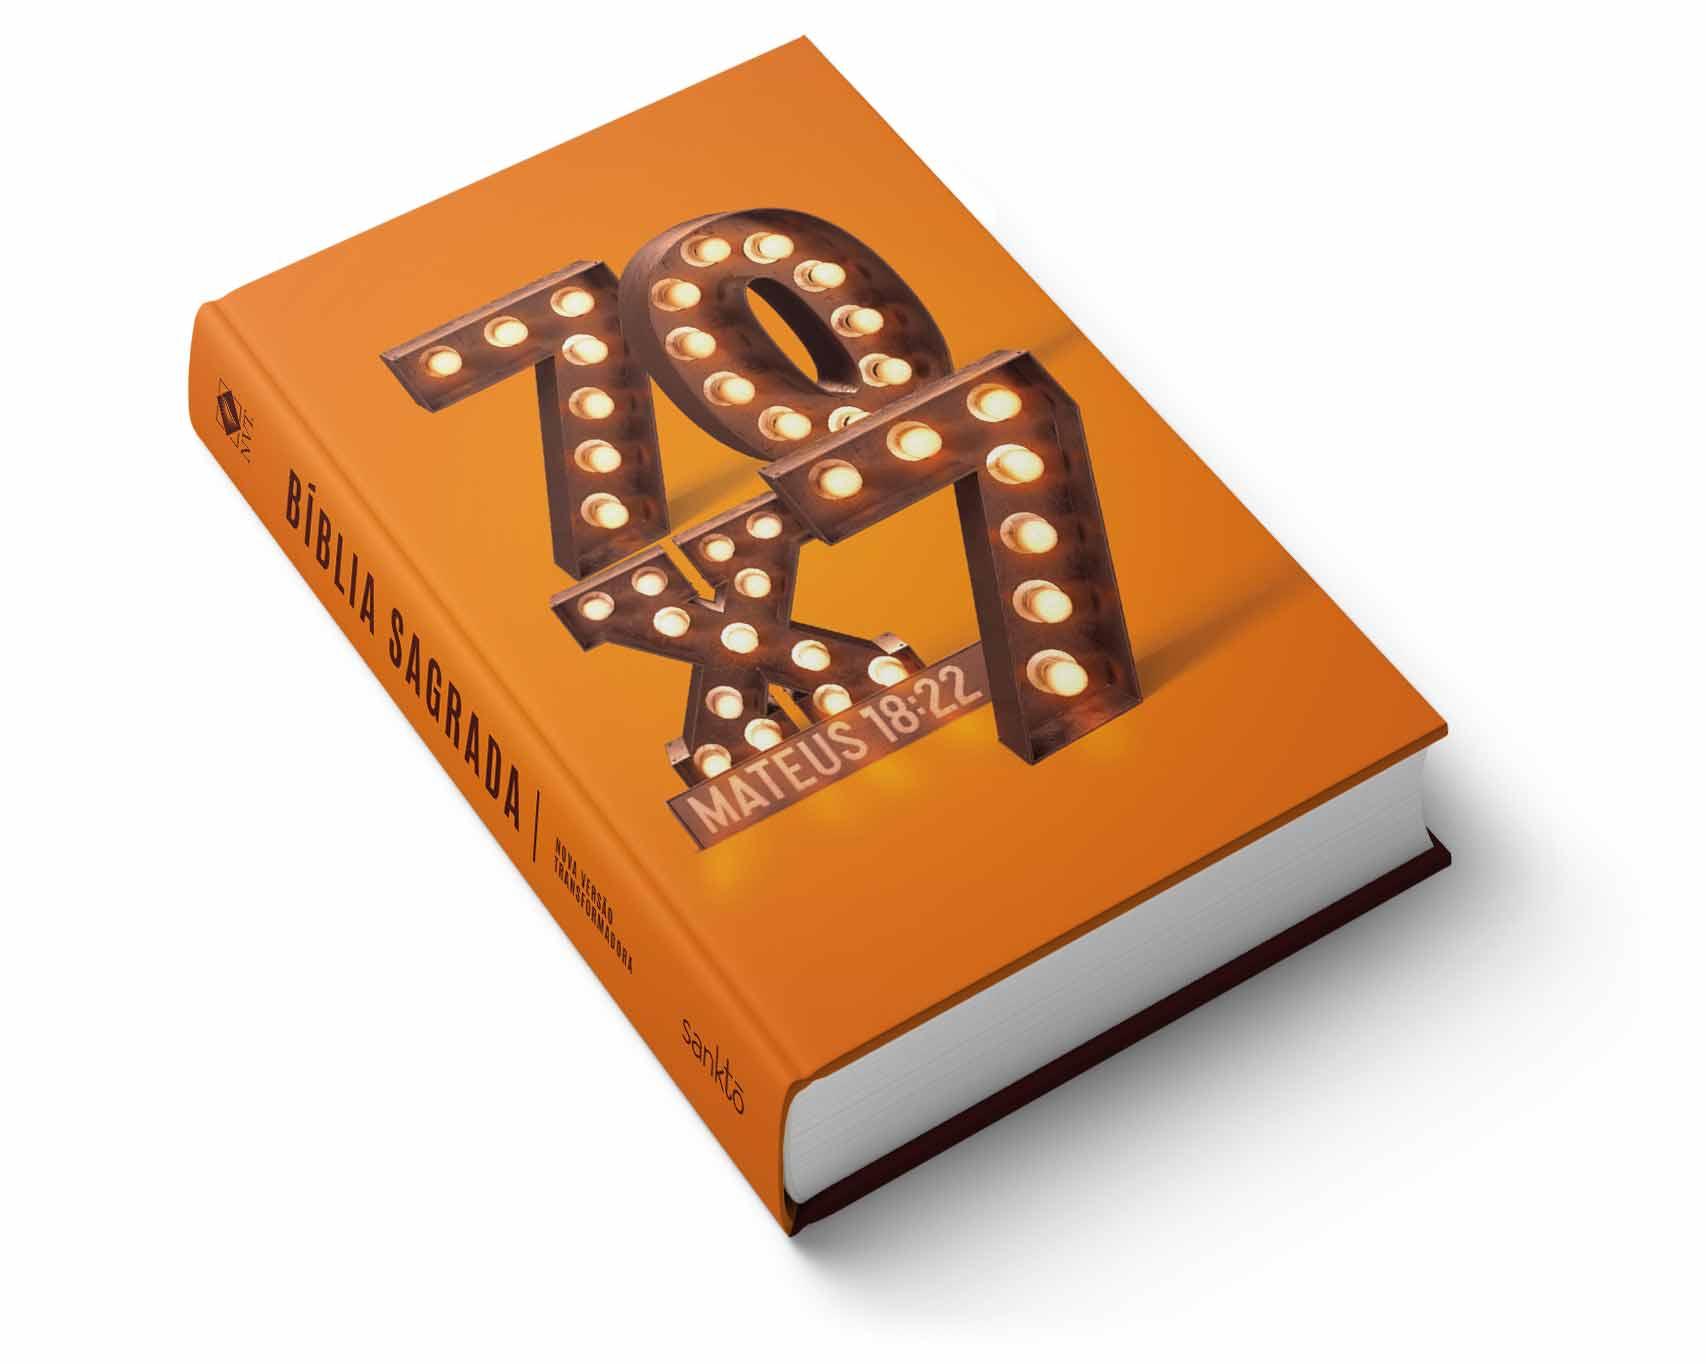 Bíblia NVT  70x7  - Sankto   Crer para entender